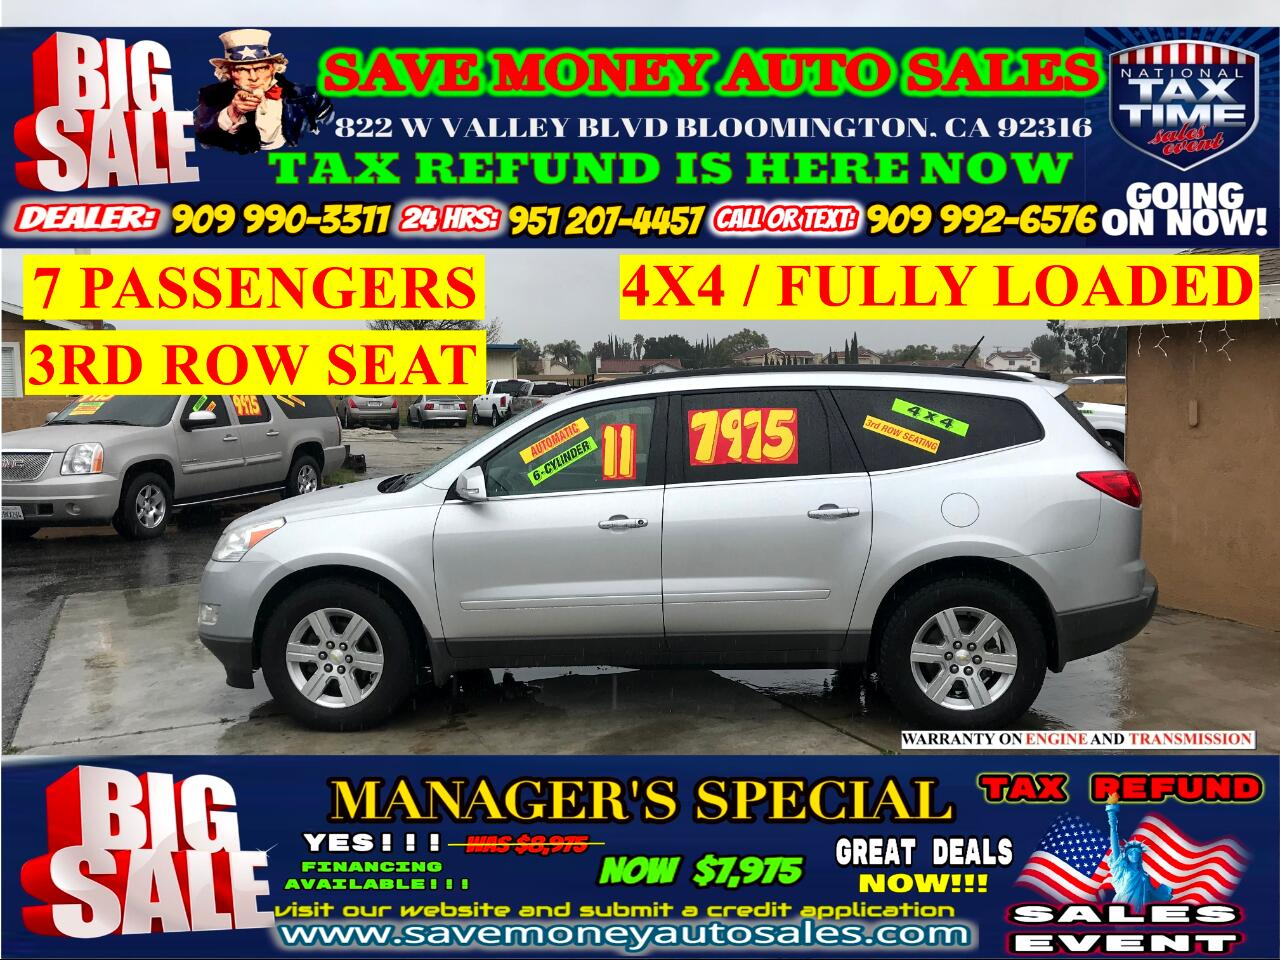 2011 Chevrolet Traverse LT AWD> 7 PASSENGERS> BACKUP CAMERA> EXTRA CLEAN